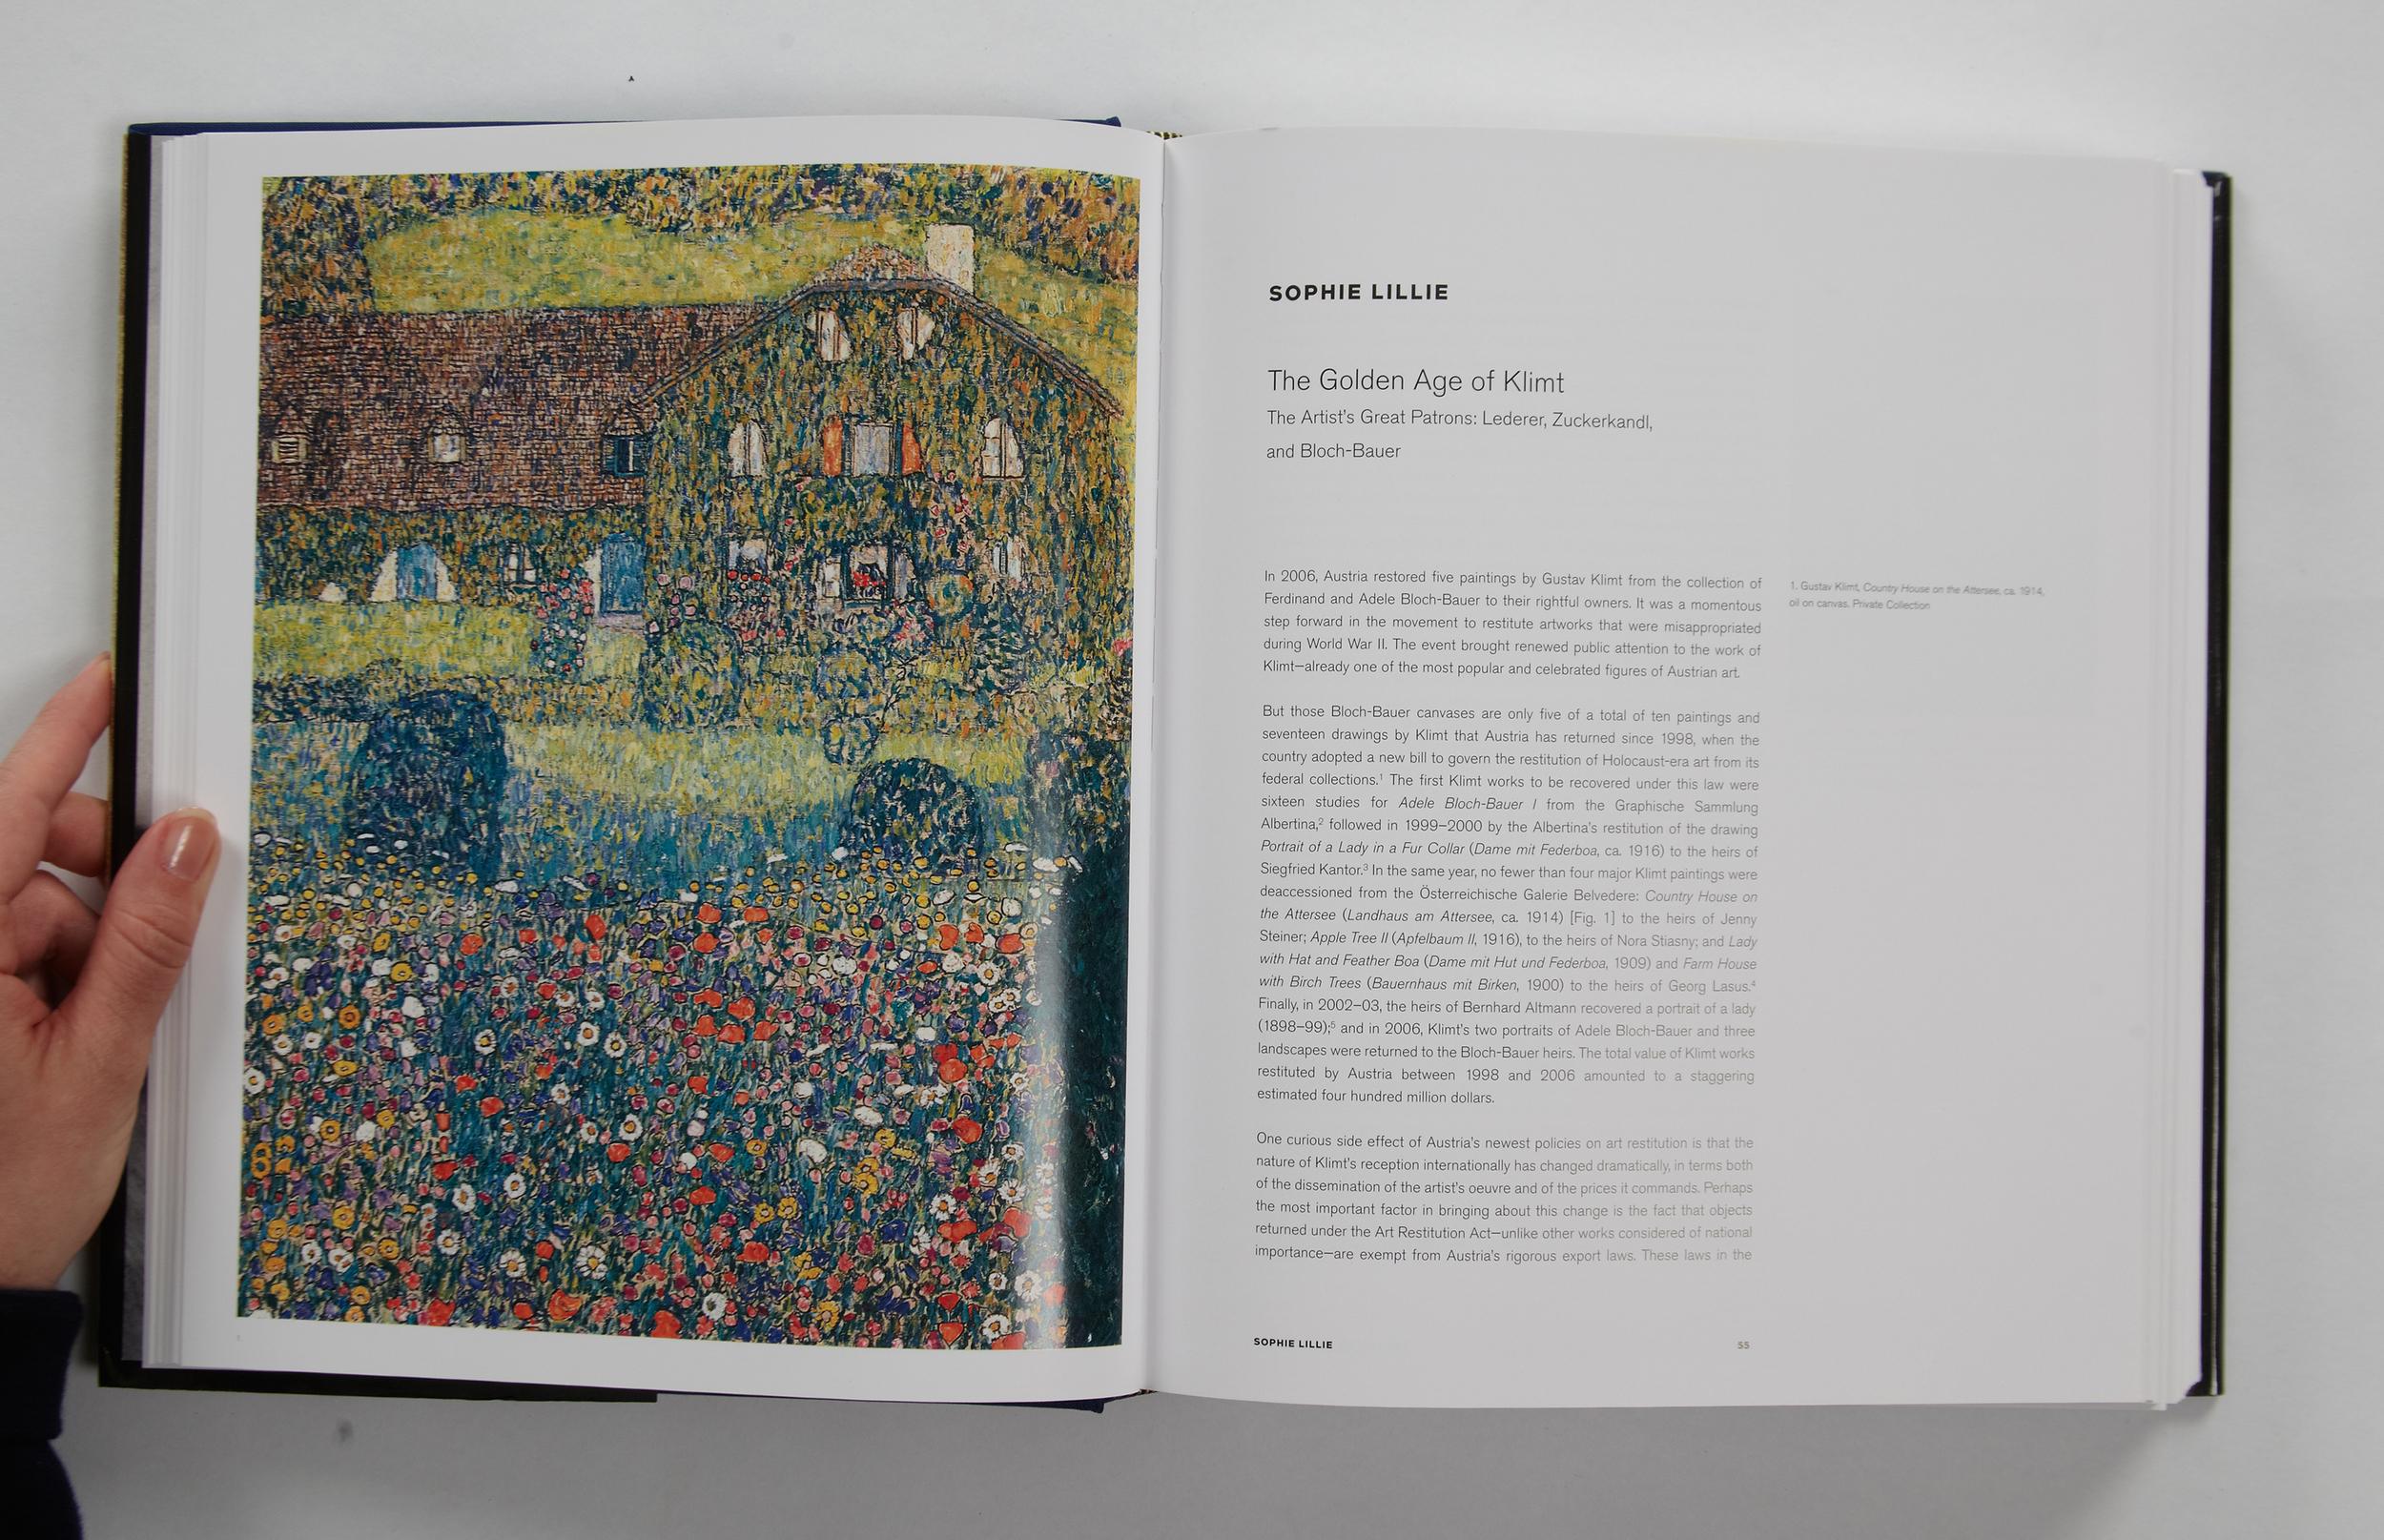 MG_Klimt_bookpost__0005_TSE_Invitations__565.jpg.jpg